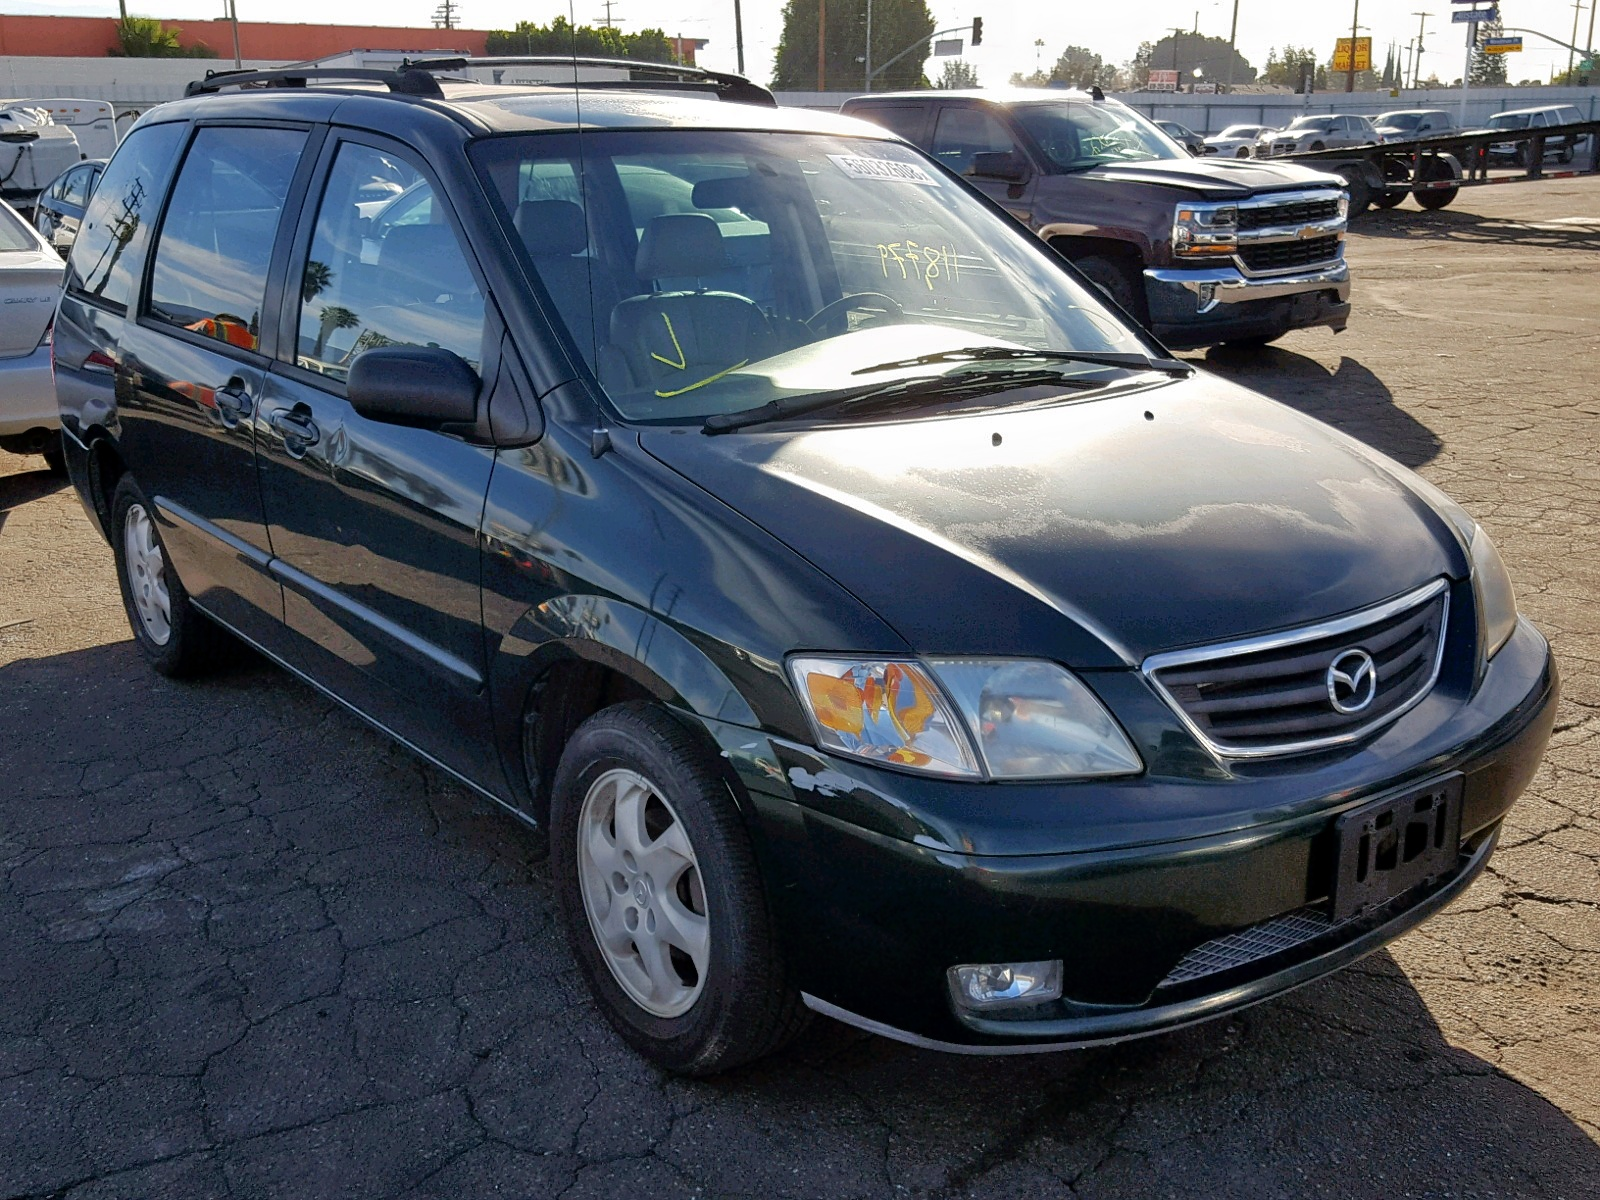 339fd84424 2001 Mazda Mpv Wagon 2.5L 6 in CA - Van Nuys (JM3LW28Y610204103) for Sale